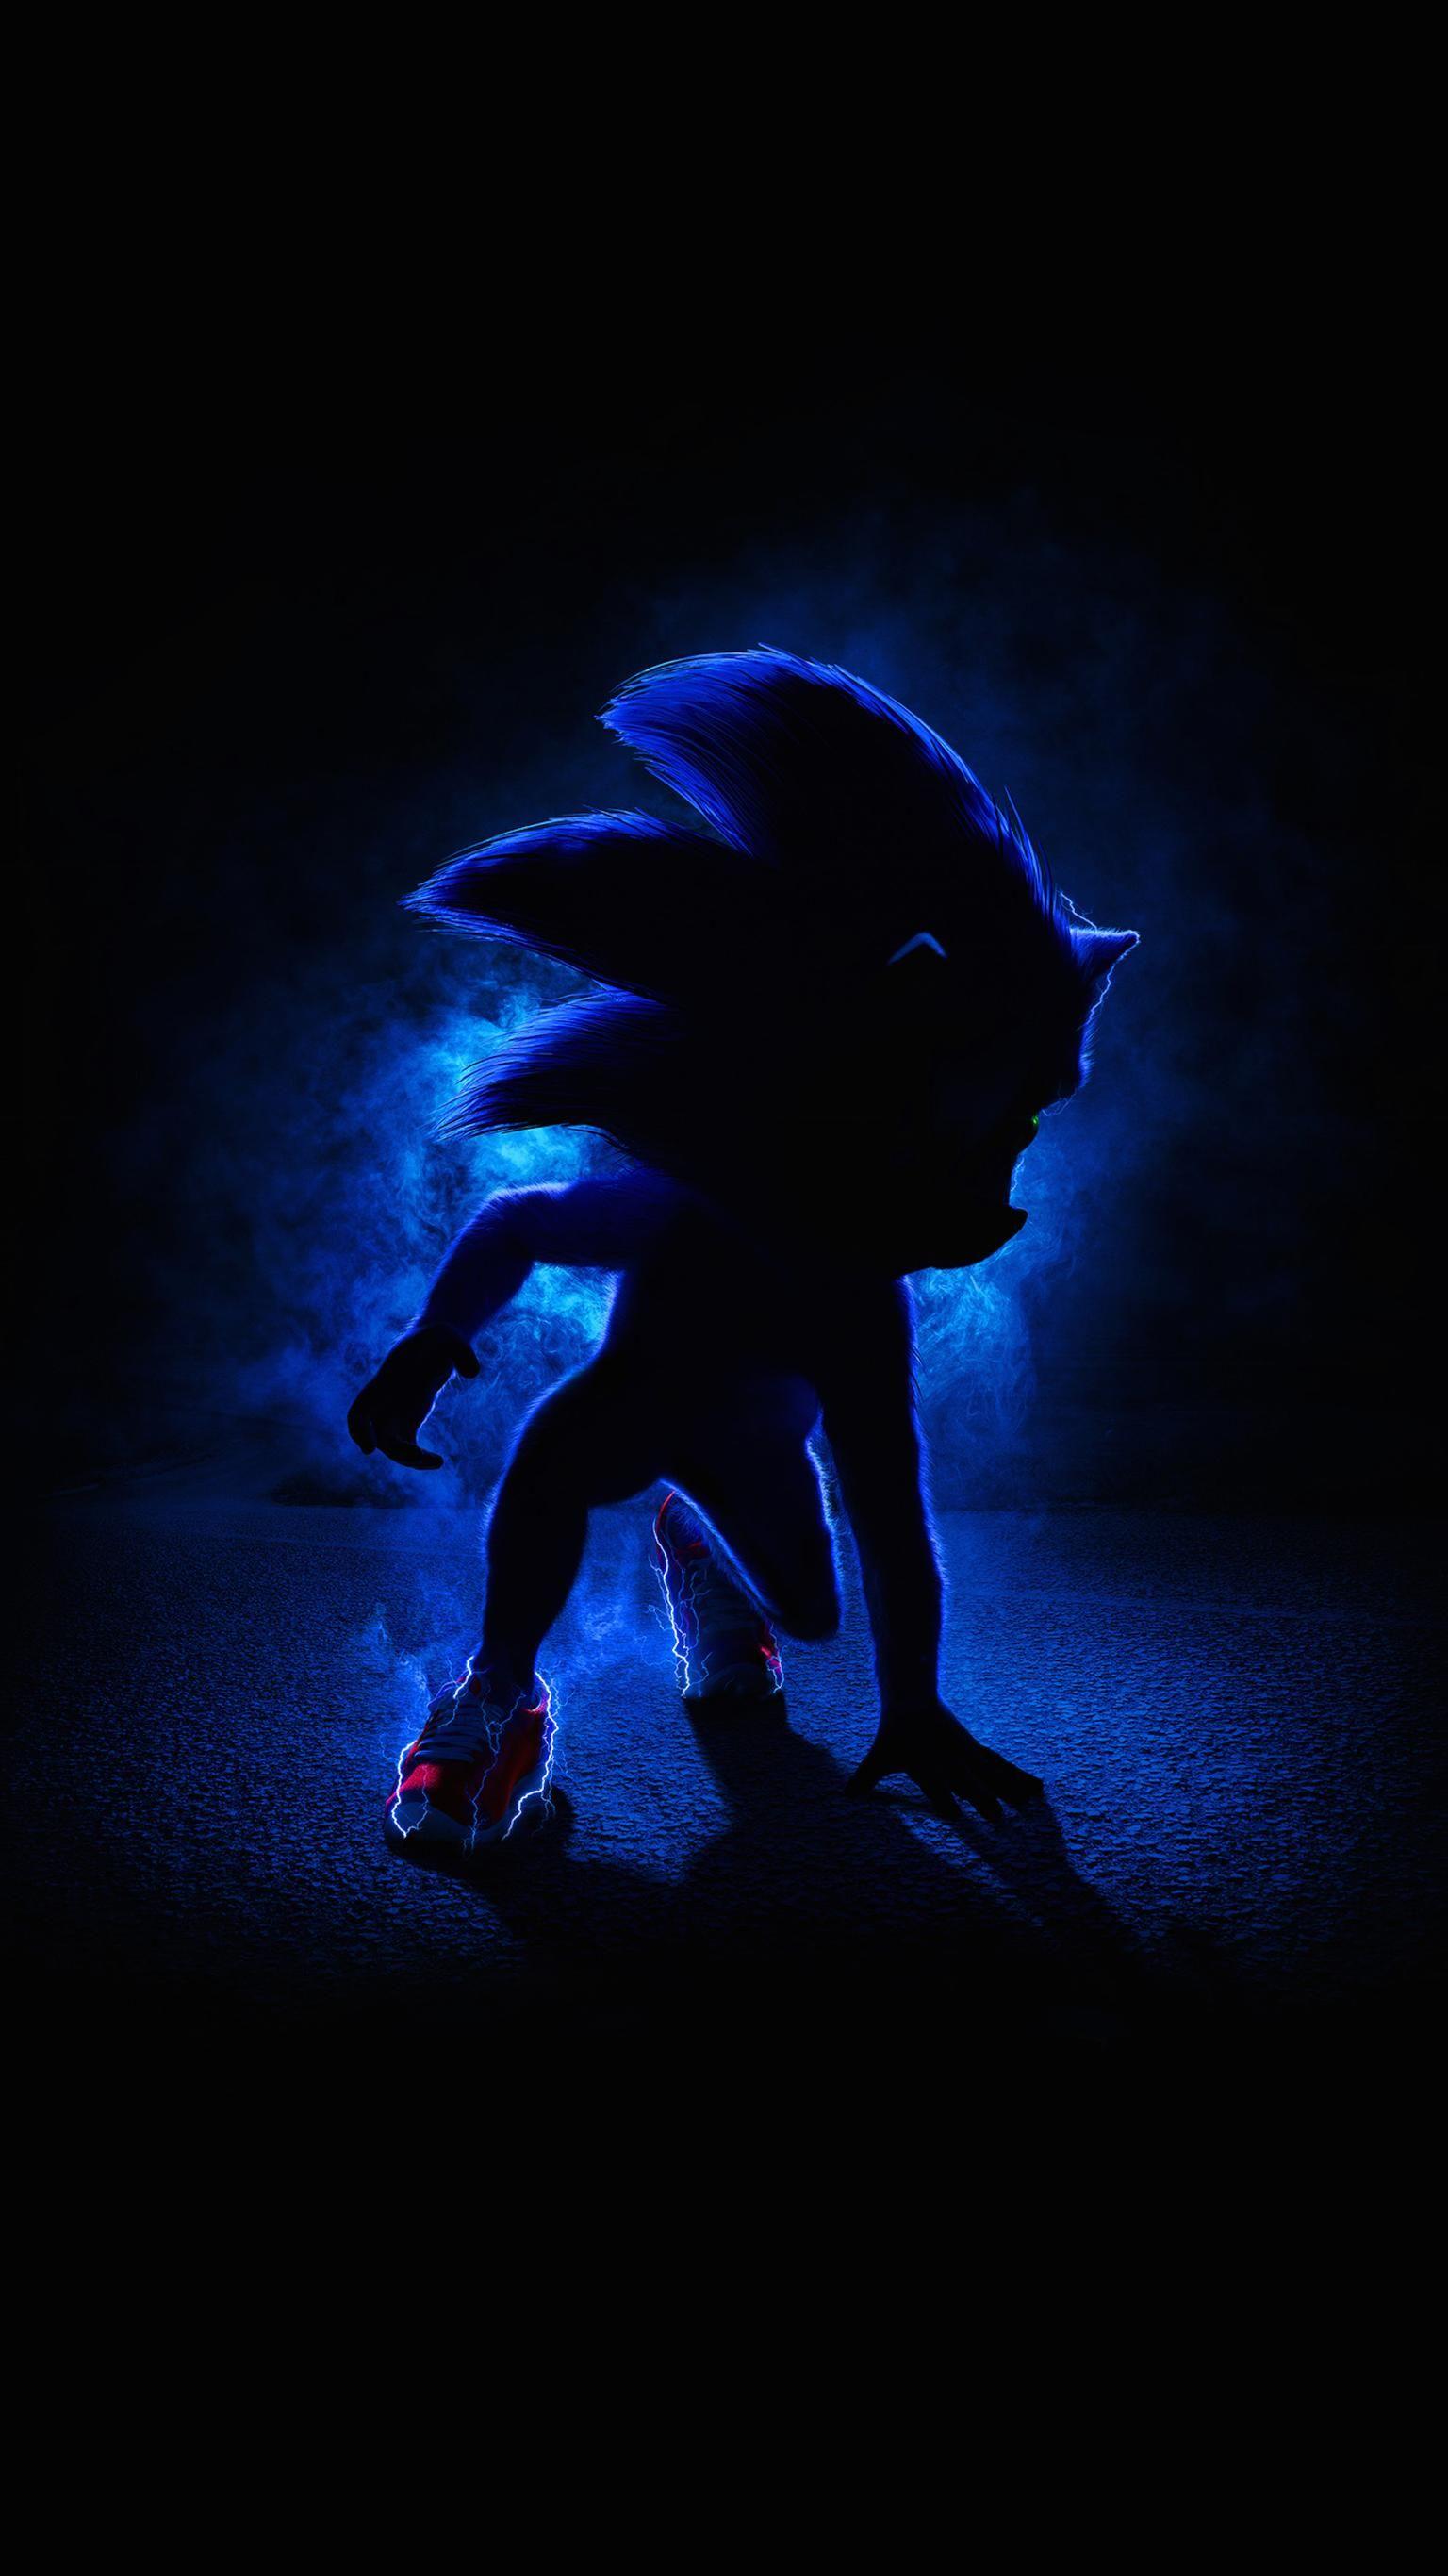 Sonic The Hedgehog 2020 Phone Wallpaper Moviemania Kartun Seni Ilustrasi Karakter